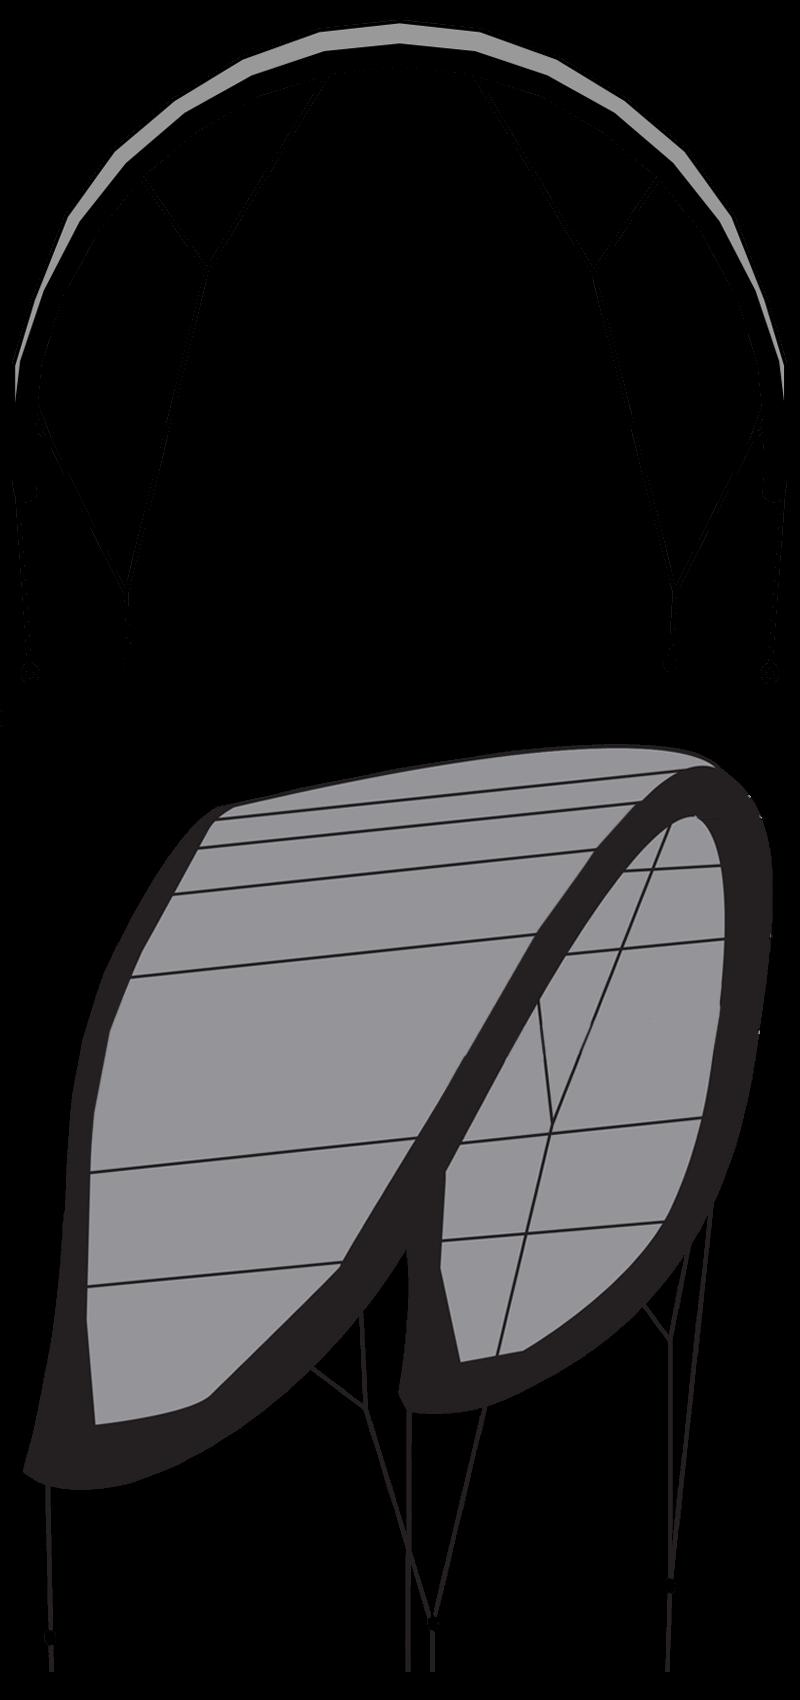 0 aile de kitesurf sans latte shape desi